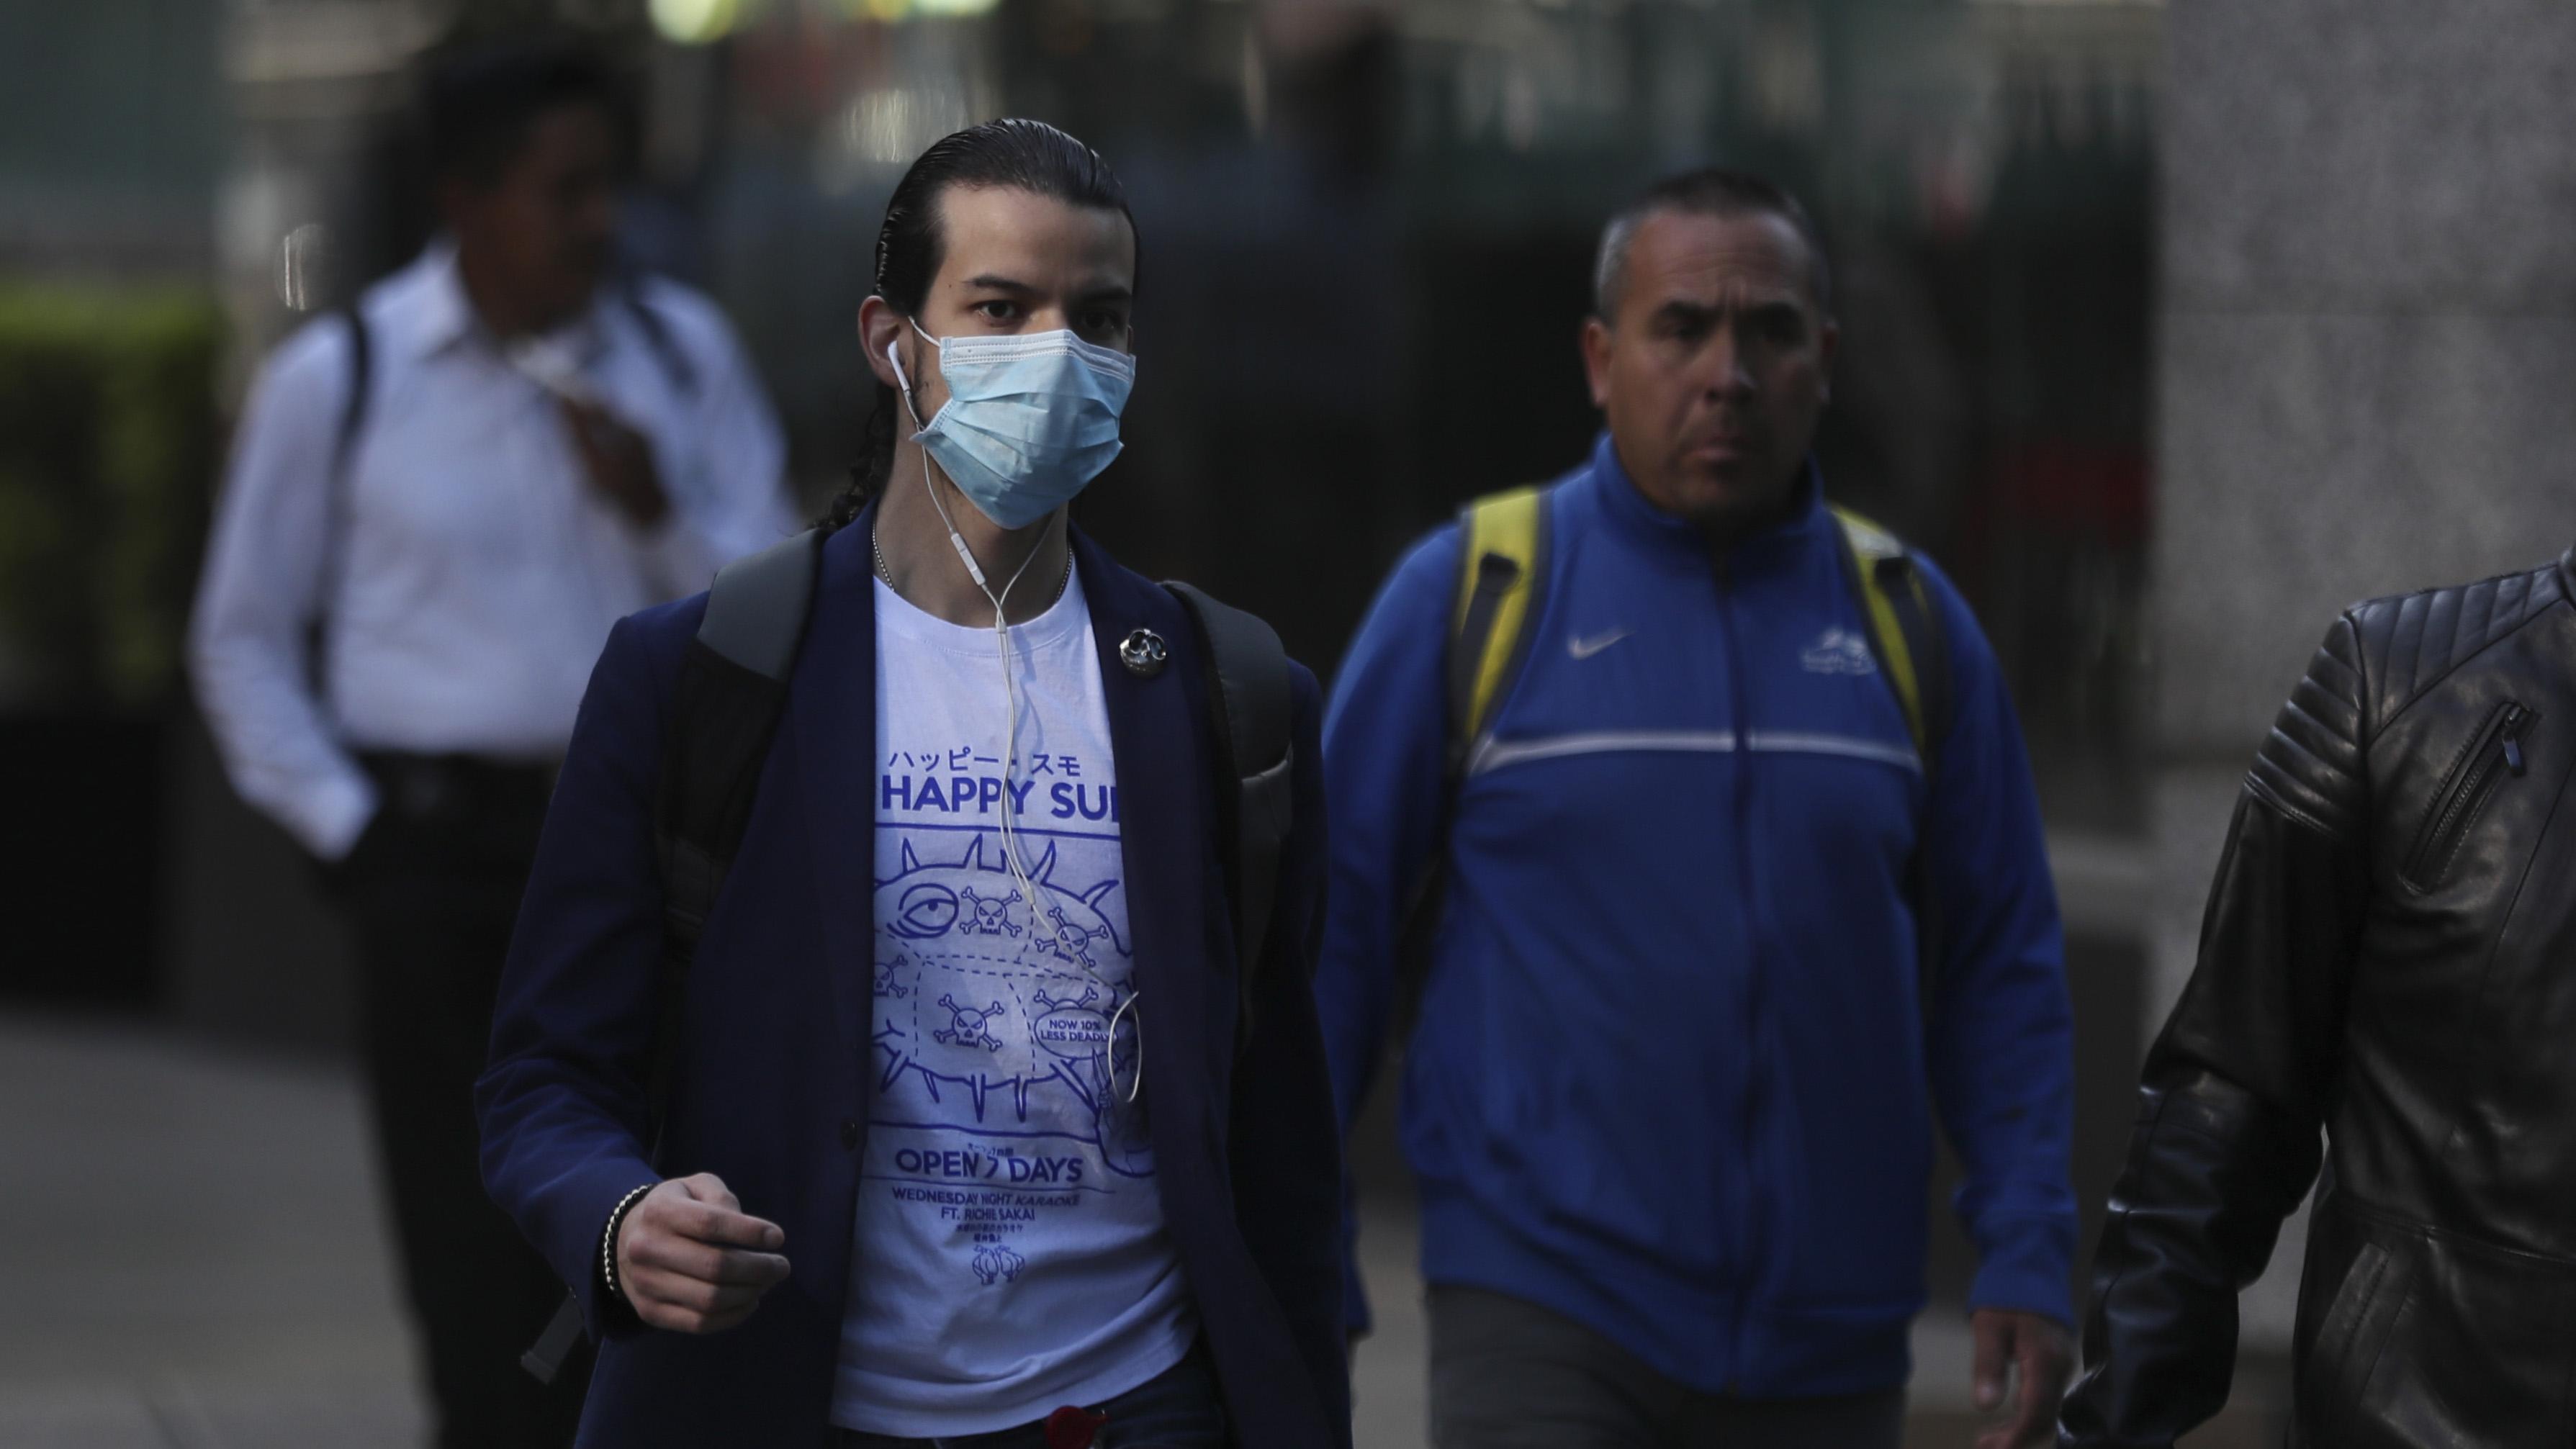 México registra sus primeros casos de coronavirus